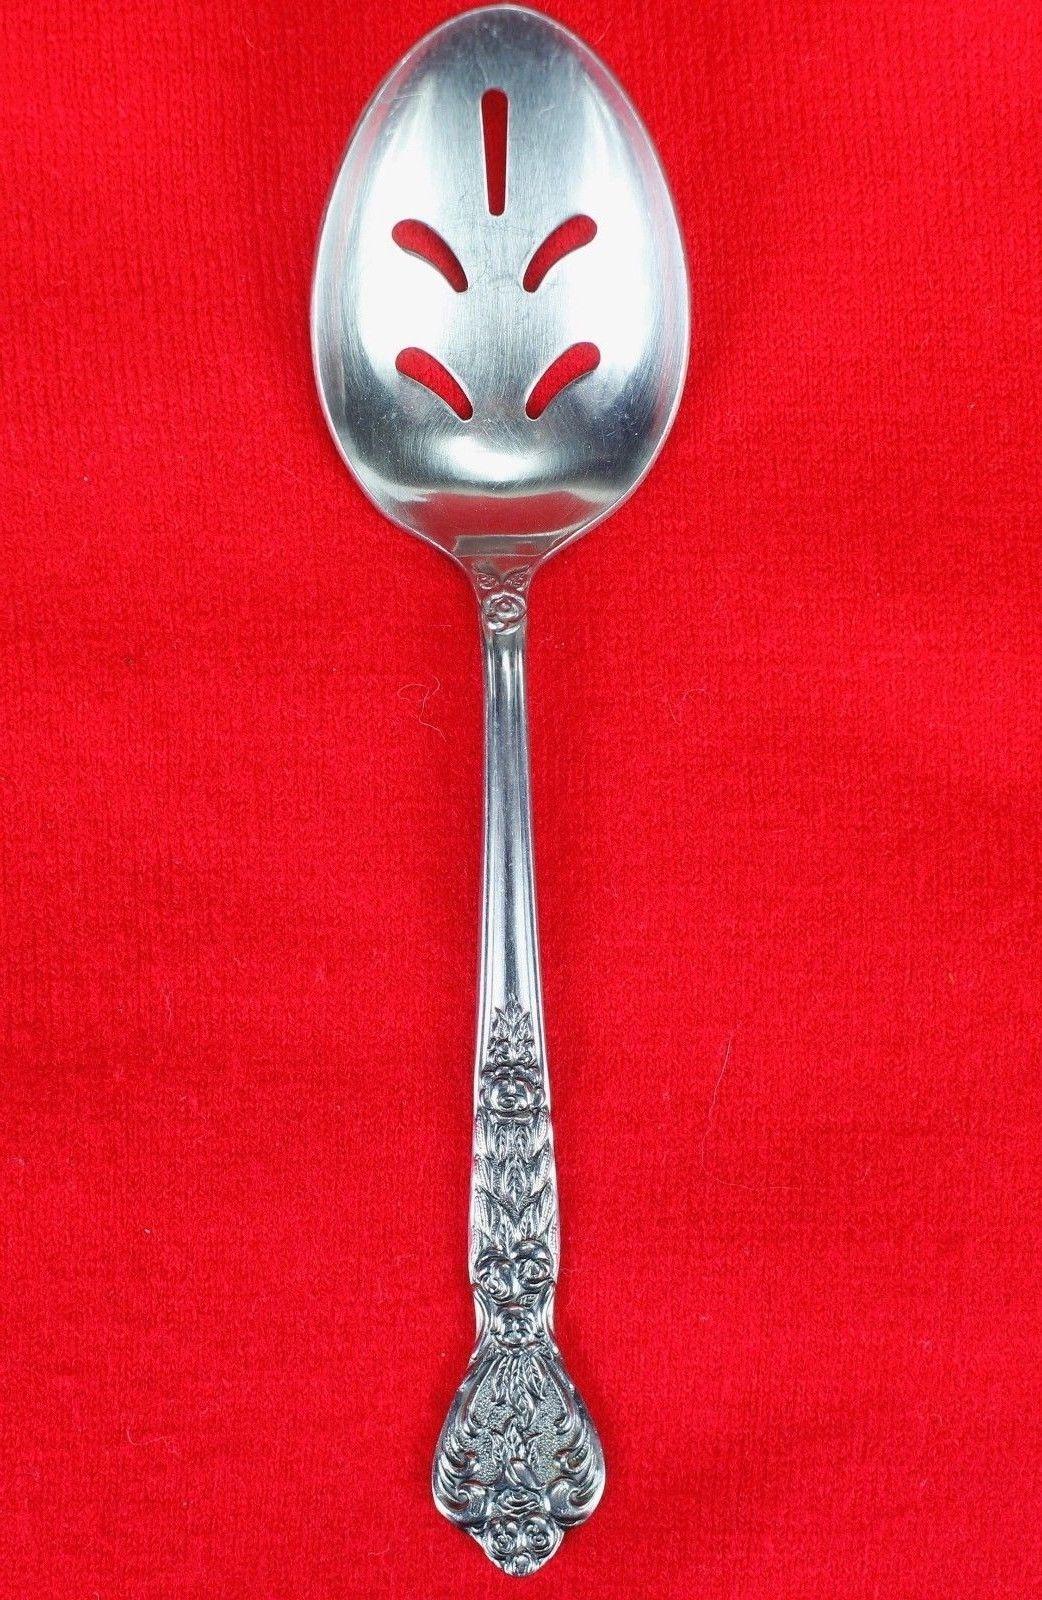 Pierced Serving Spoon Merchandise Service Versailles Stainless Glossy Flatware